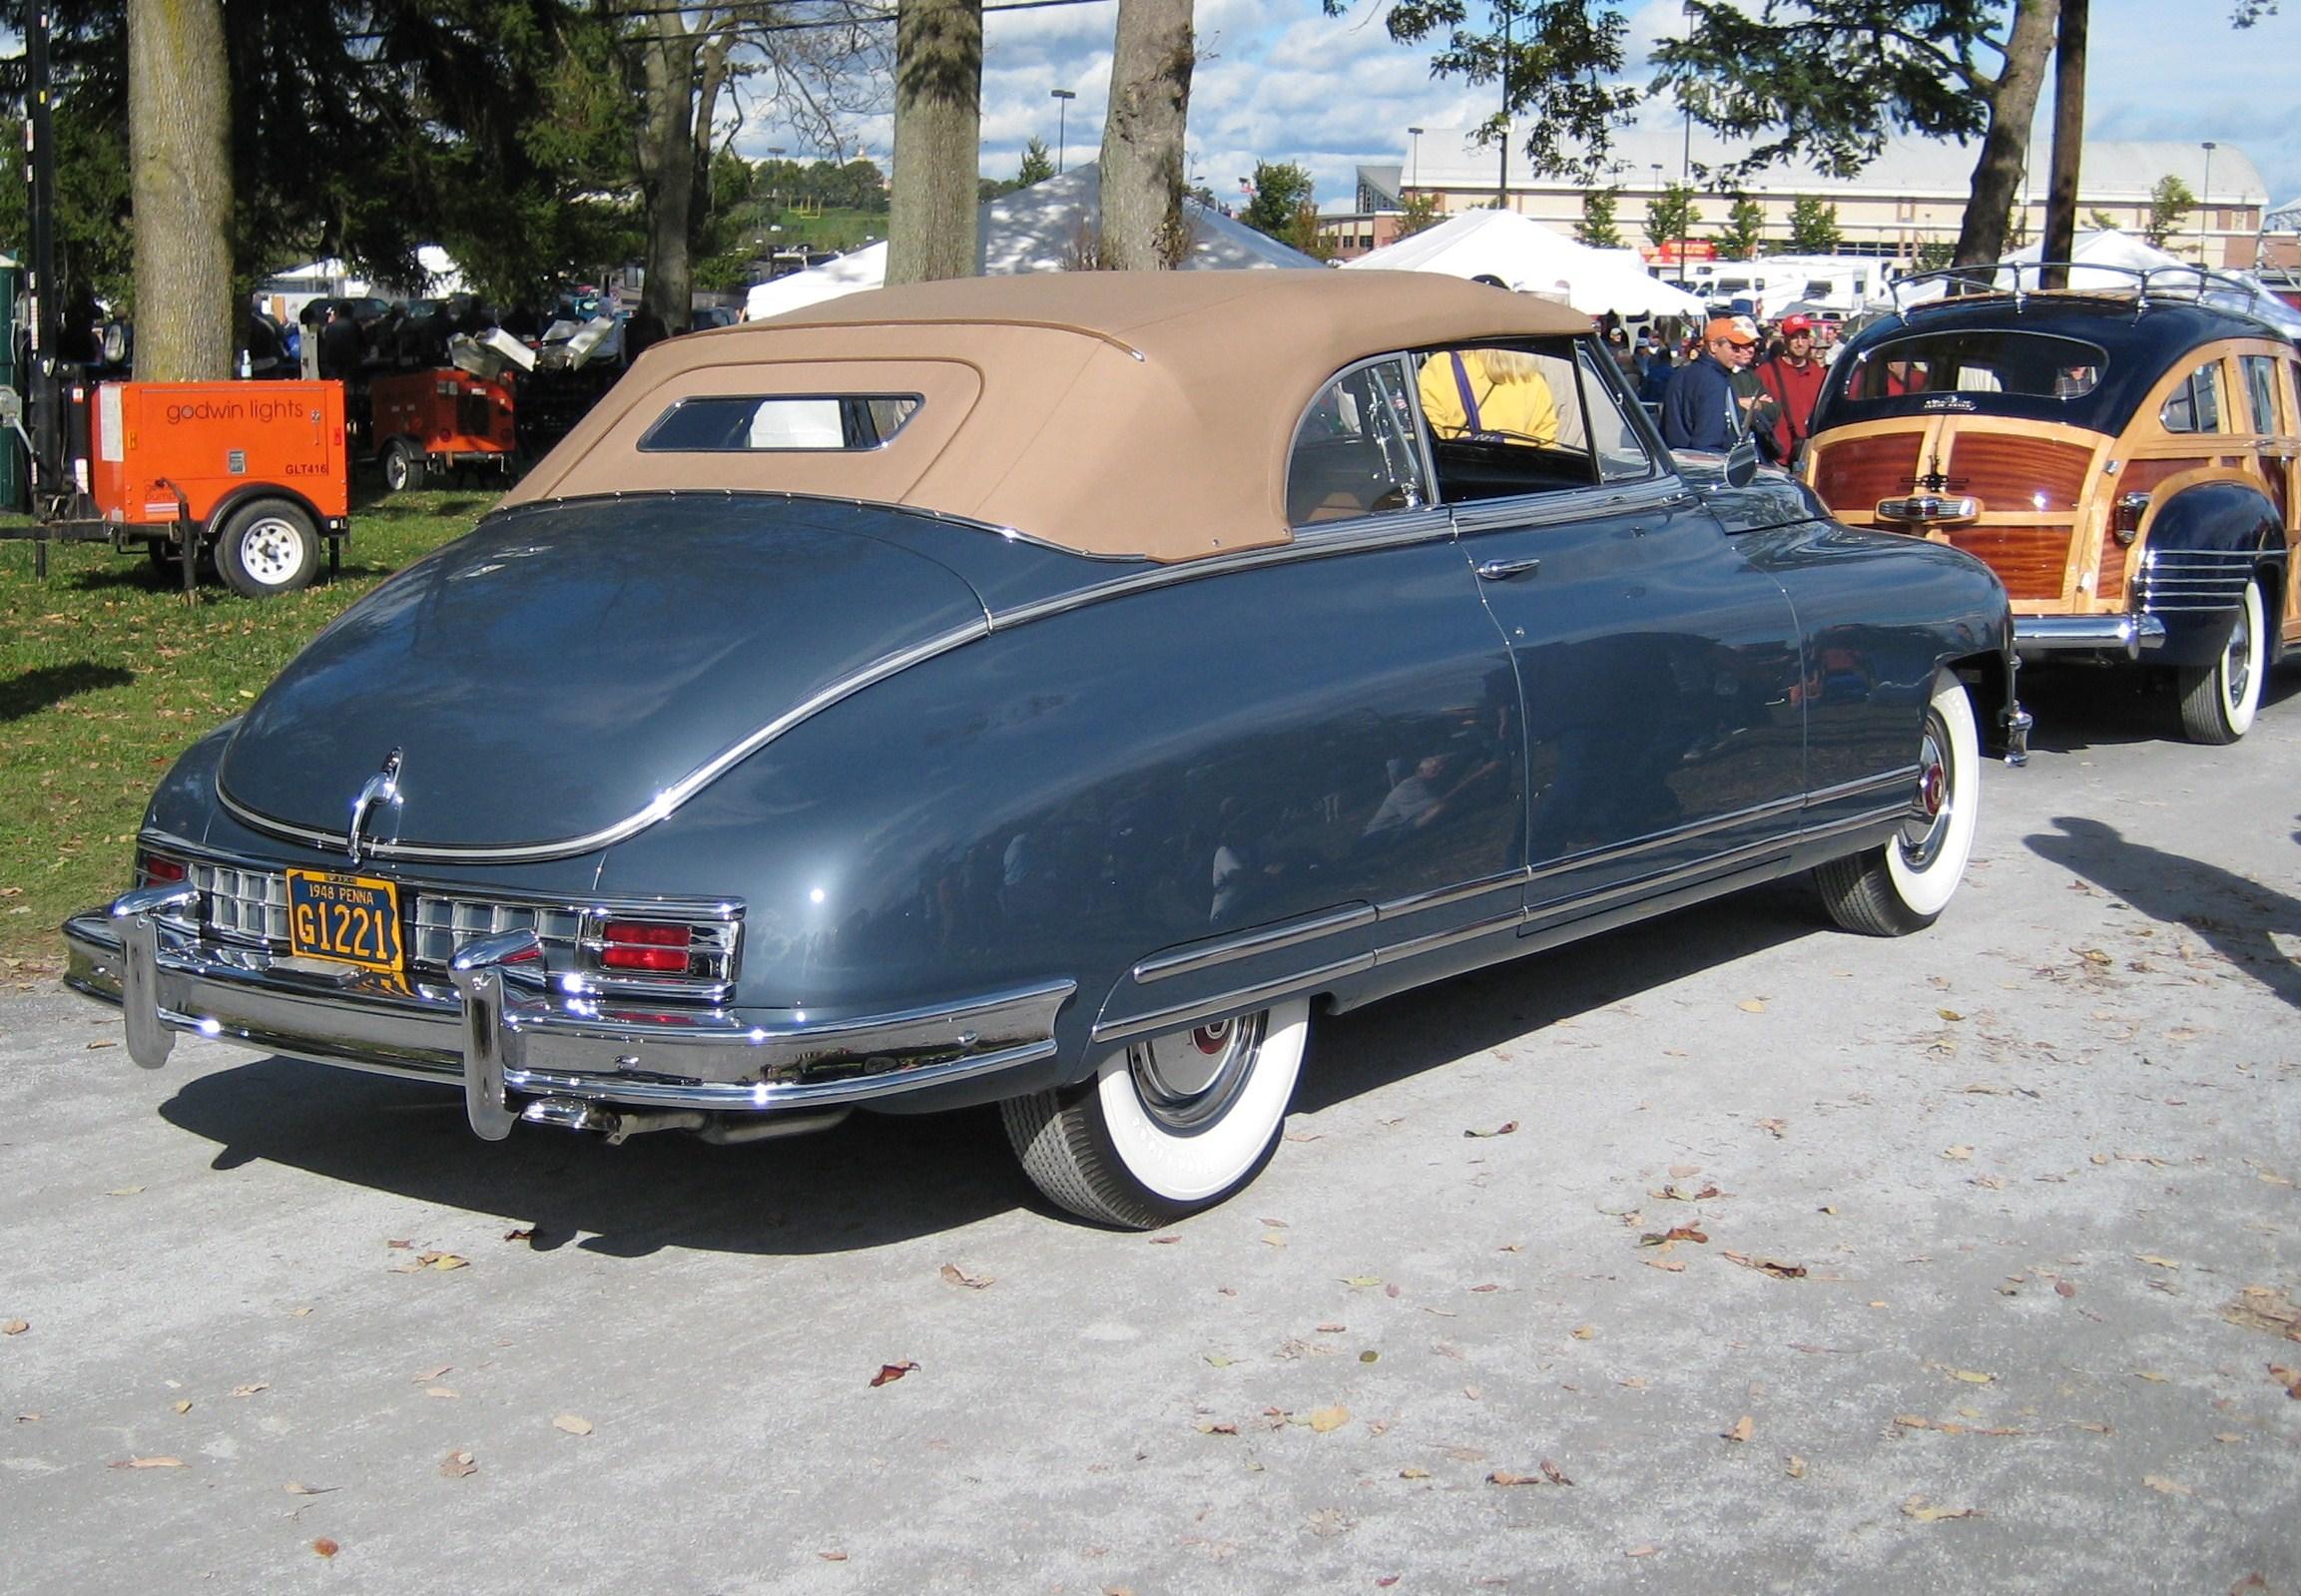 file 1948 packard custom 8 4349817989 wikimedia mons Pontiac Convertible 1943 file 1948 packard custom 8 4349817989